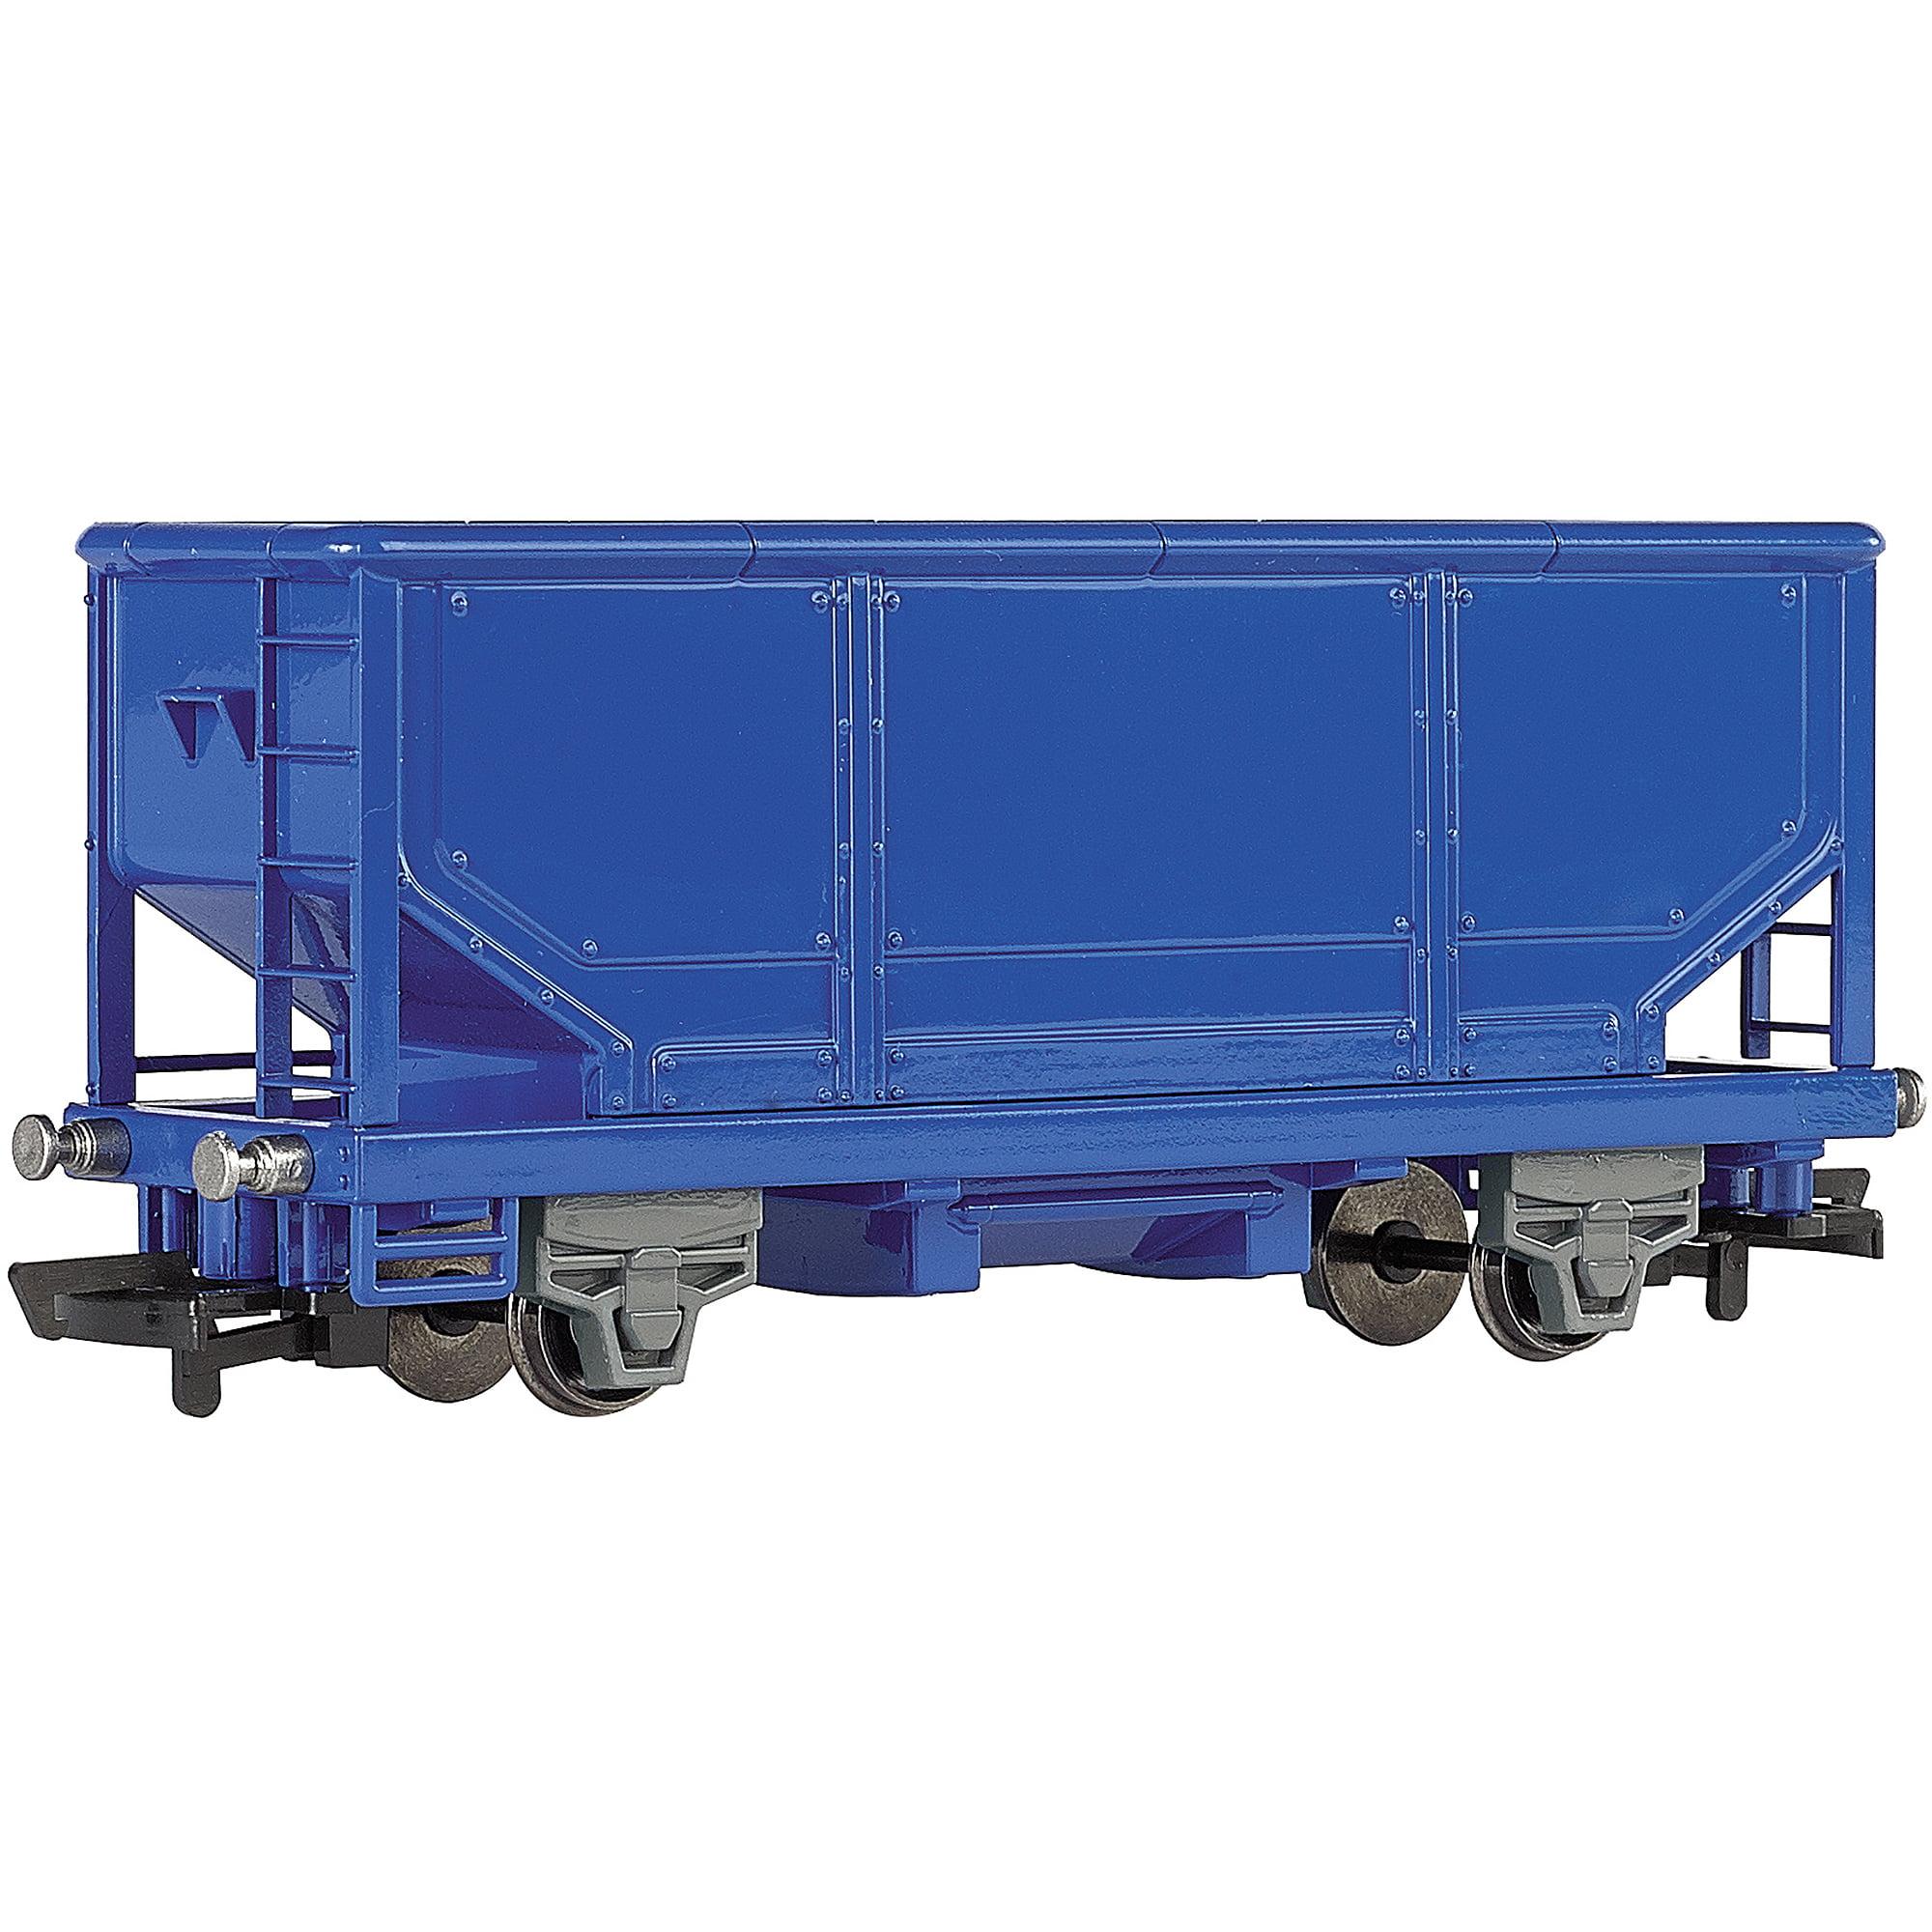 Bachmann Trains Chuggington Hopper Car, Blue, HO Scale Train